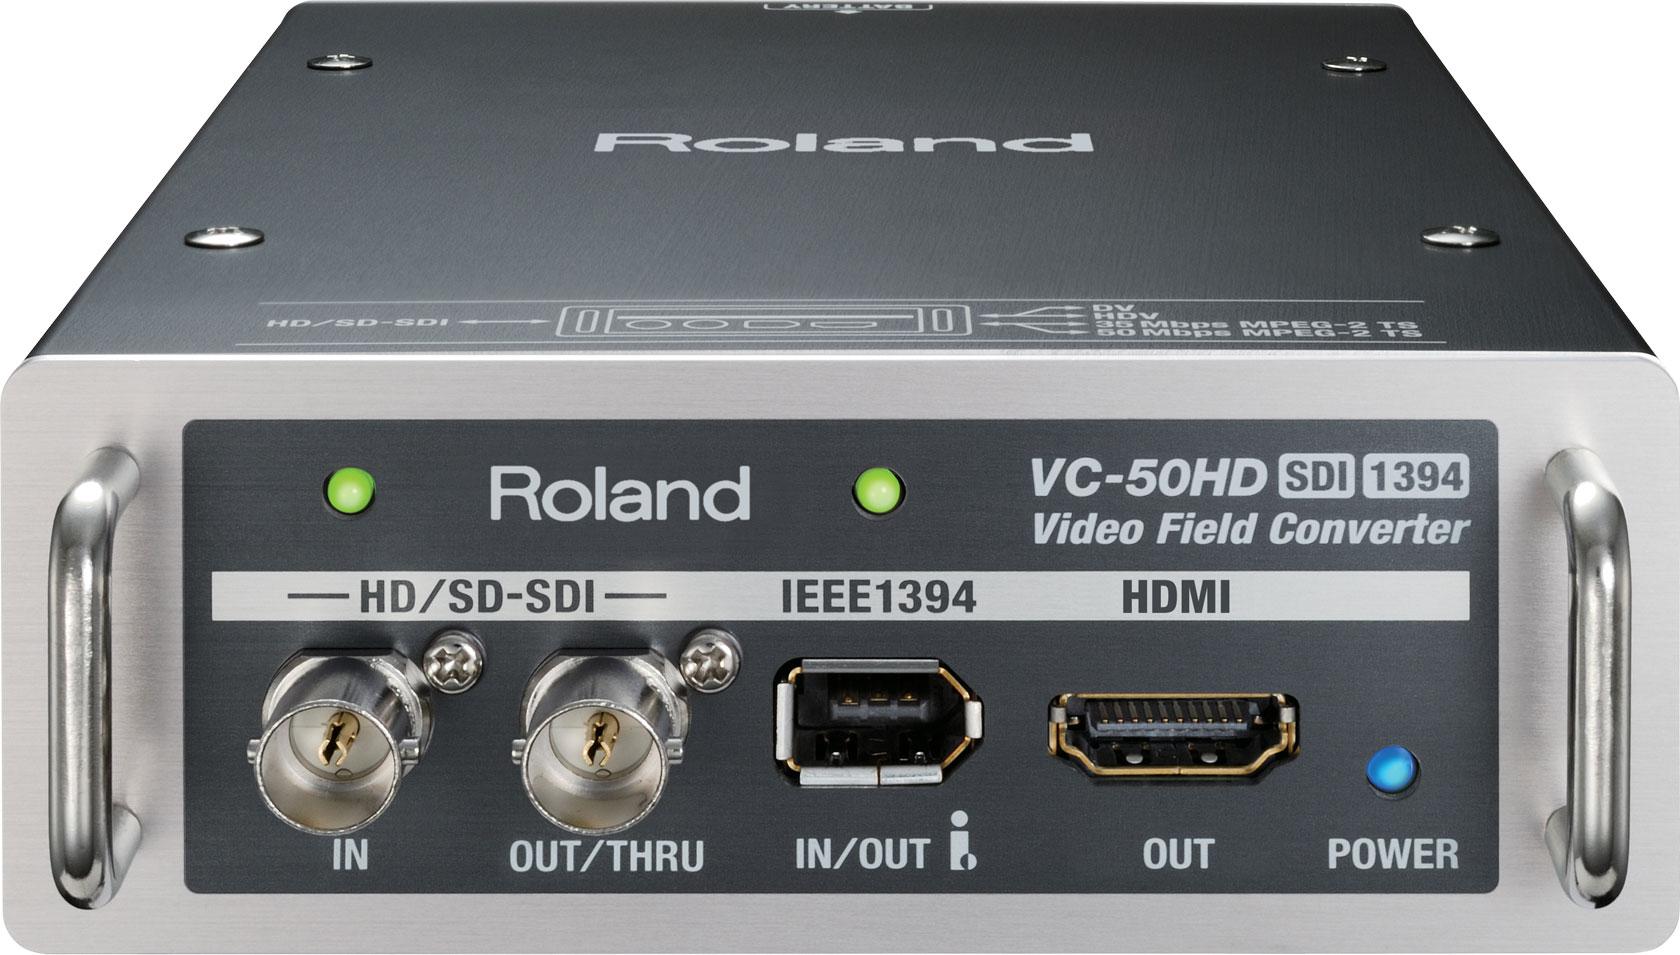 VC-50HD | Video Field Converter - Roland Pro A/V